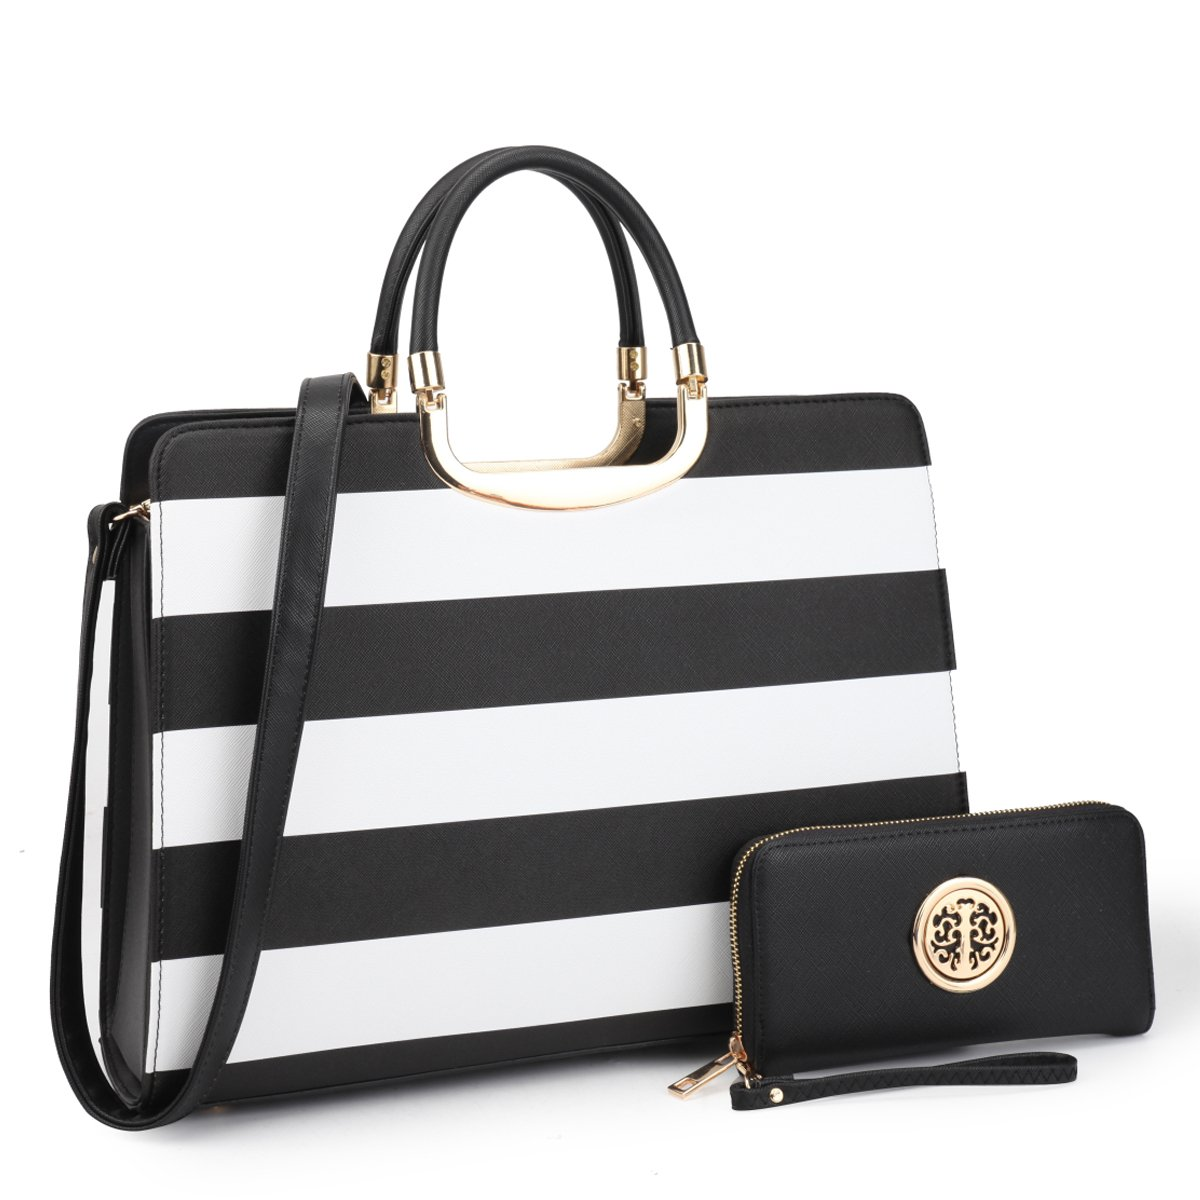 Designer Women Laptop Briefcase, Large Handbag for Lady PU Leather Satchel Lightweight Tote Summer Cross-Body Purse 02-2828 BK/WT